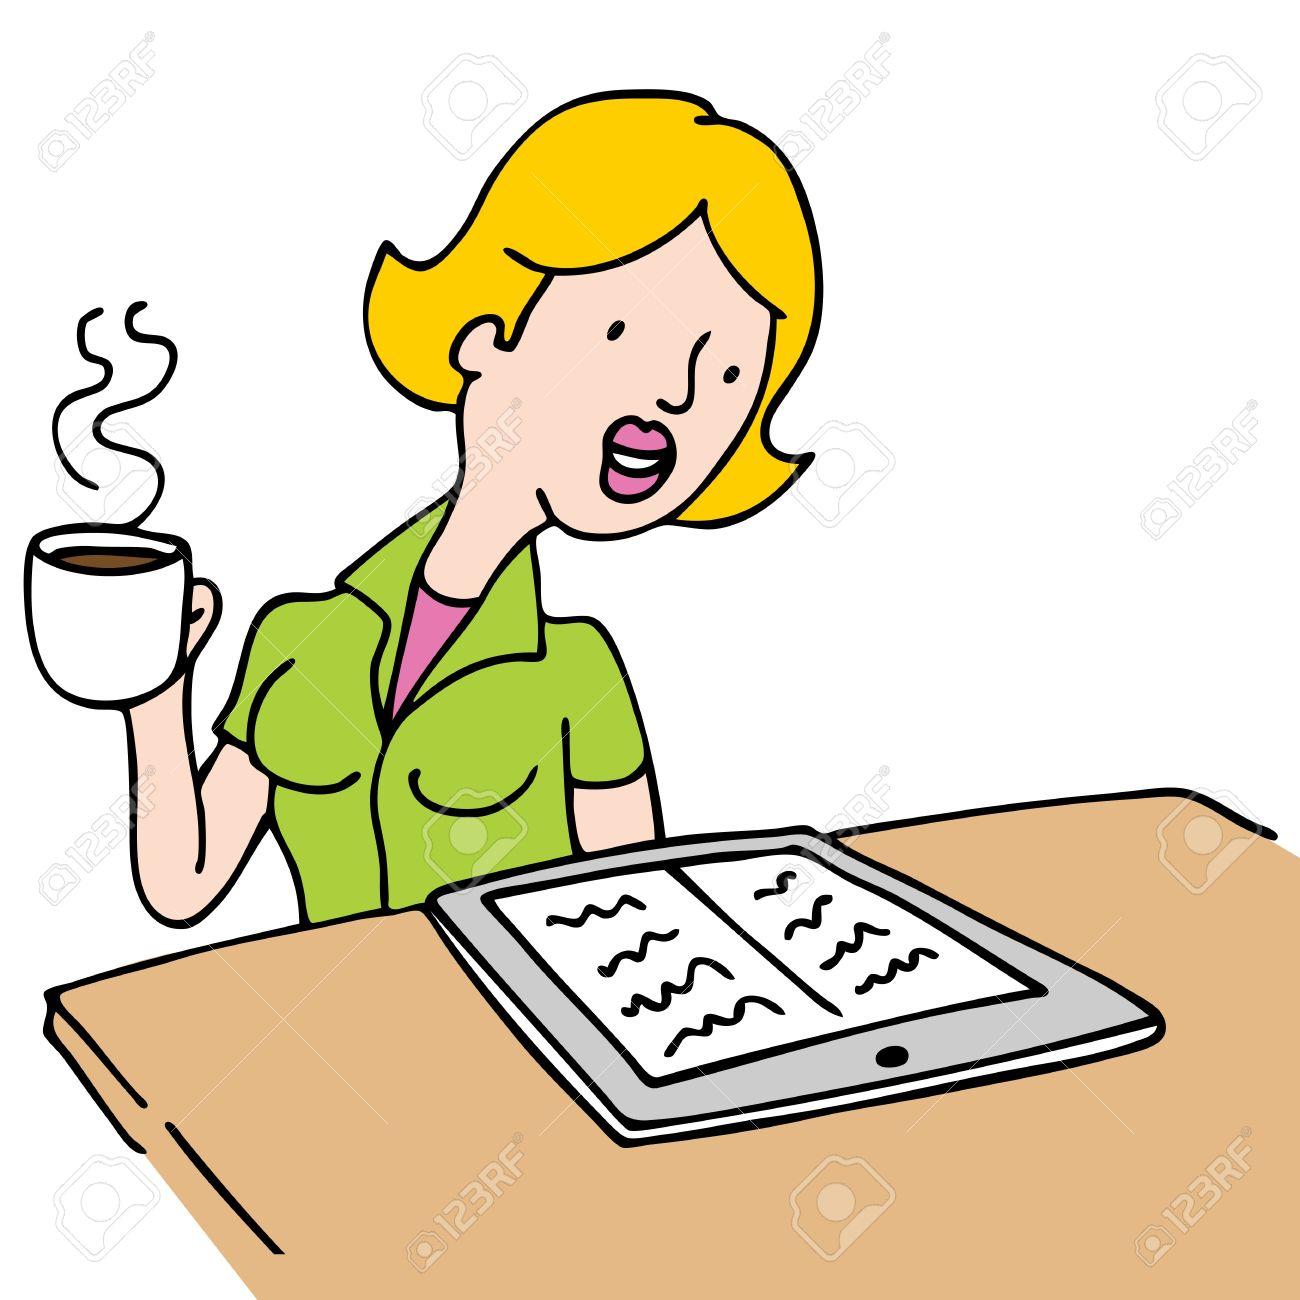 Clipart kaffee trinken png stock Frau Trinkt Kaffee Lizenzfreie Vektorgrafiken Kaufen: 123RF png stock